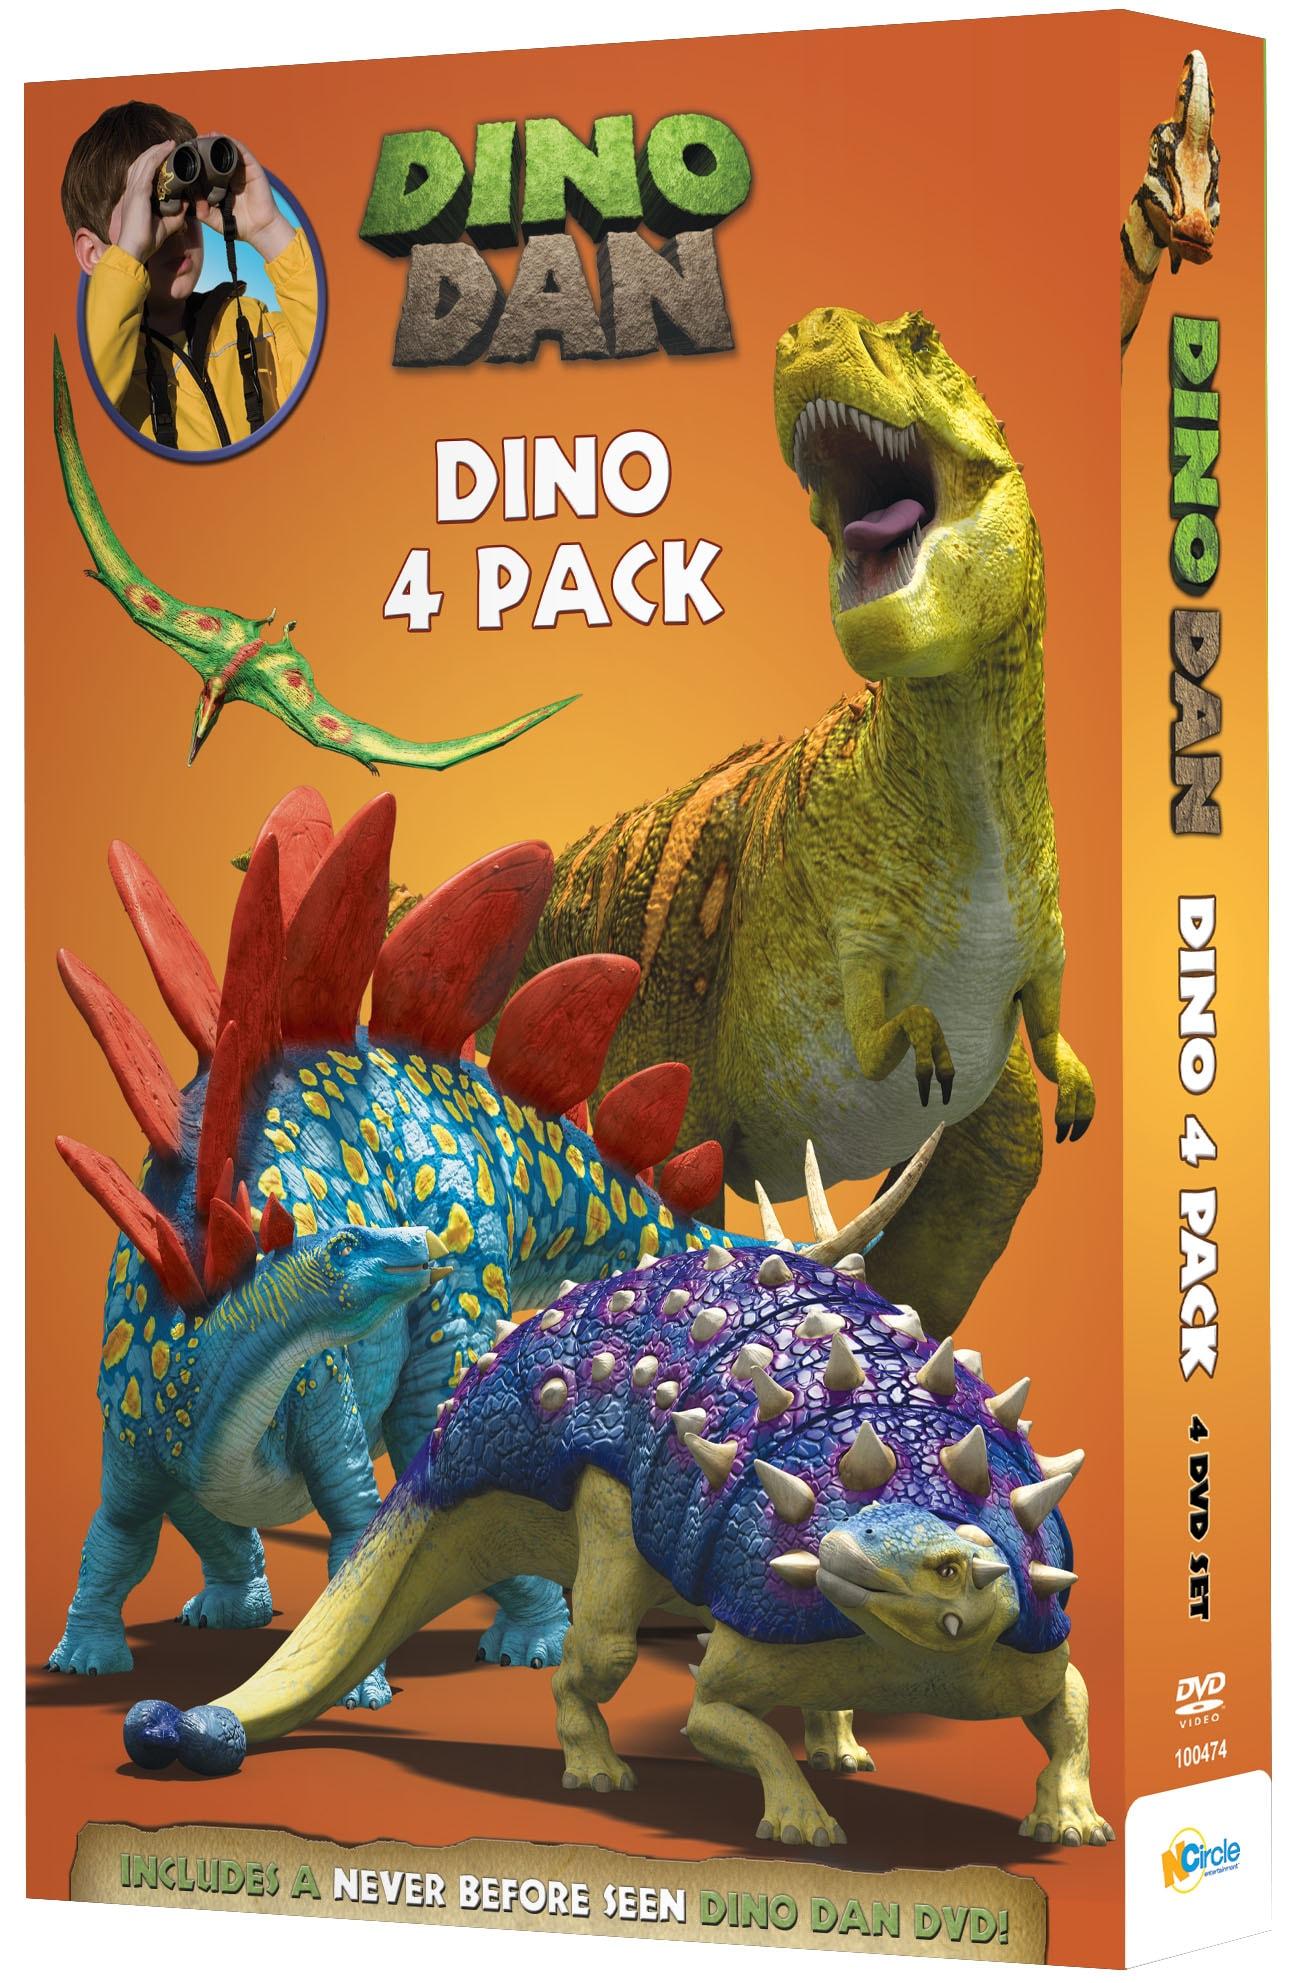 Dino Dan: Dino 4 Pack (DVD)